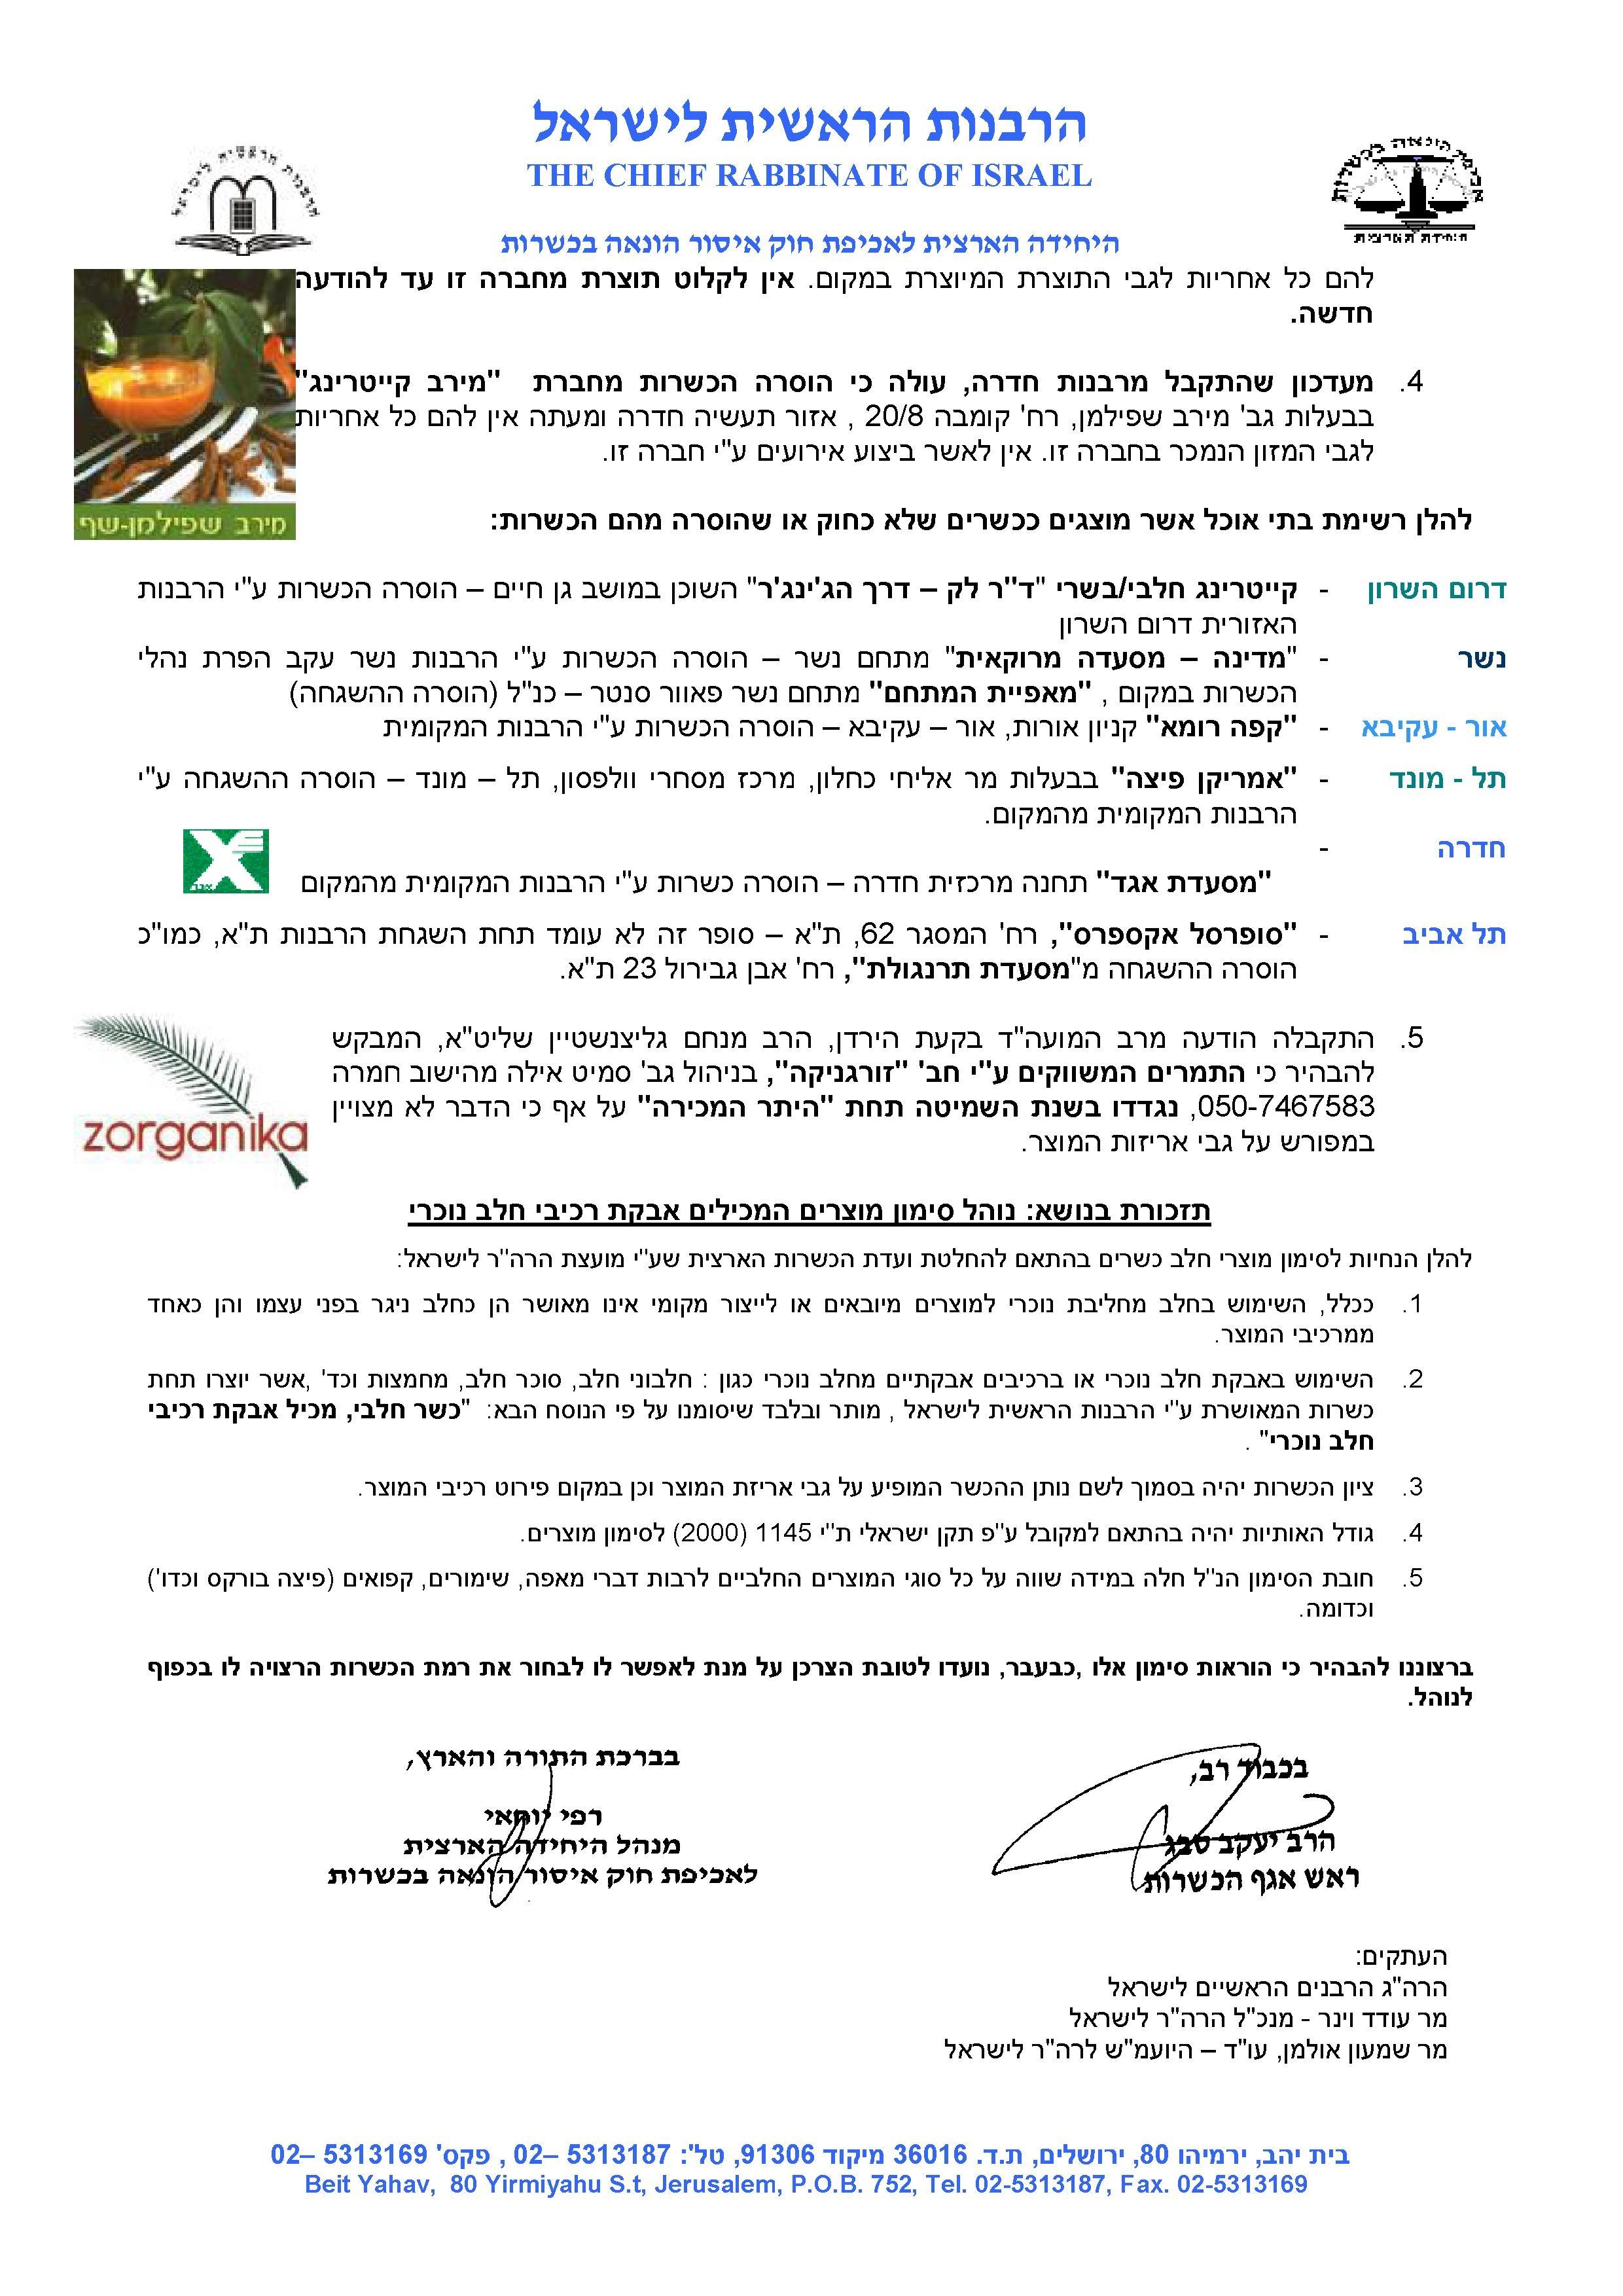 rabbanut-update-16-may-5-2009_p02